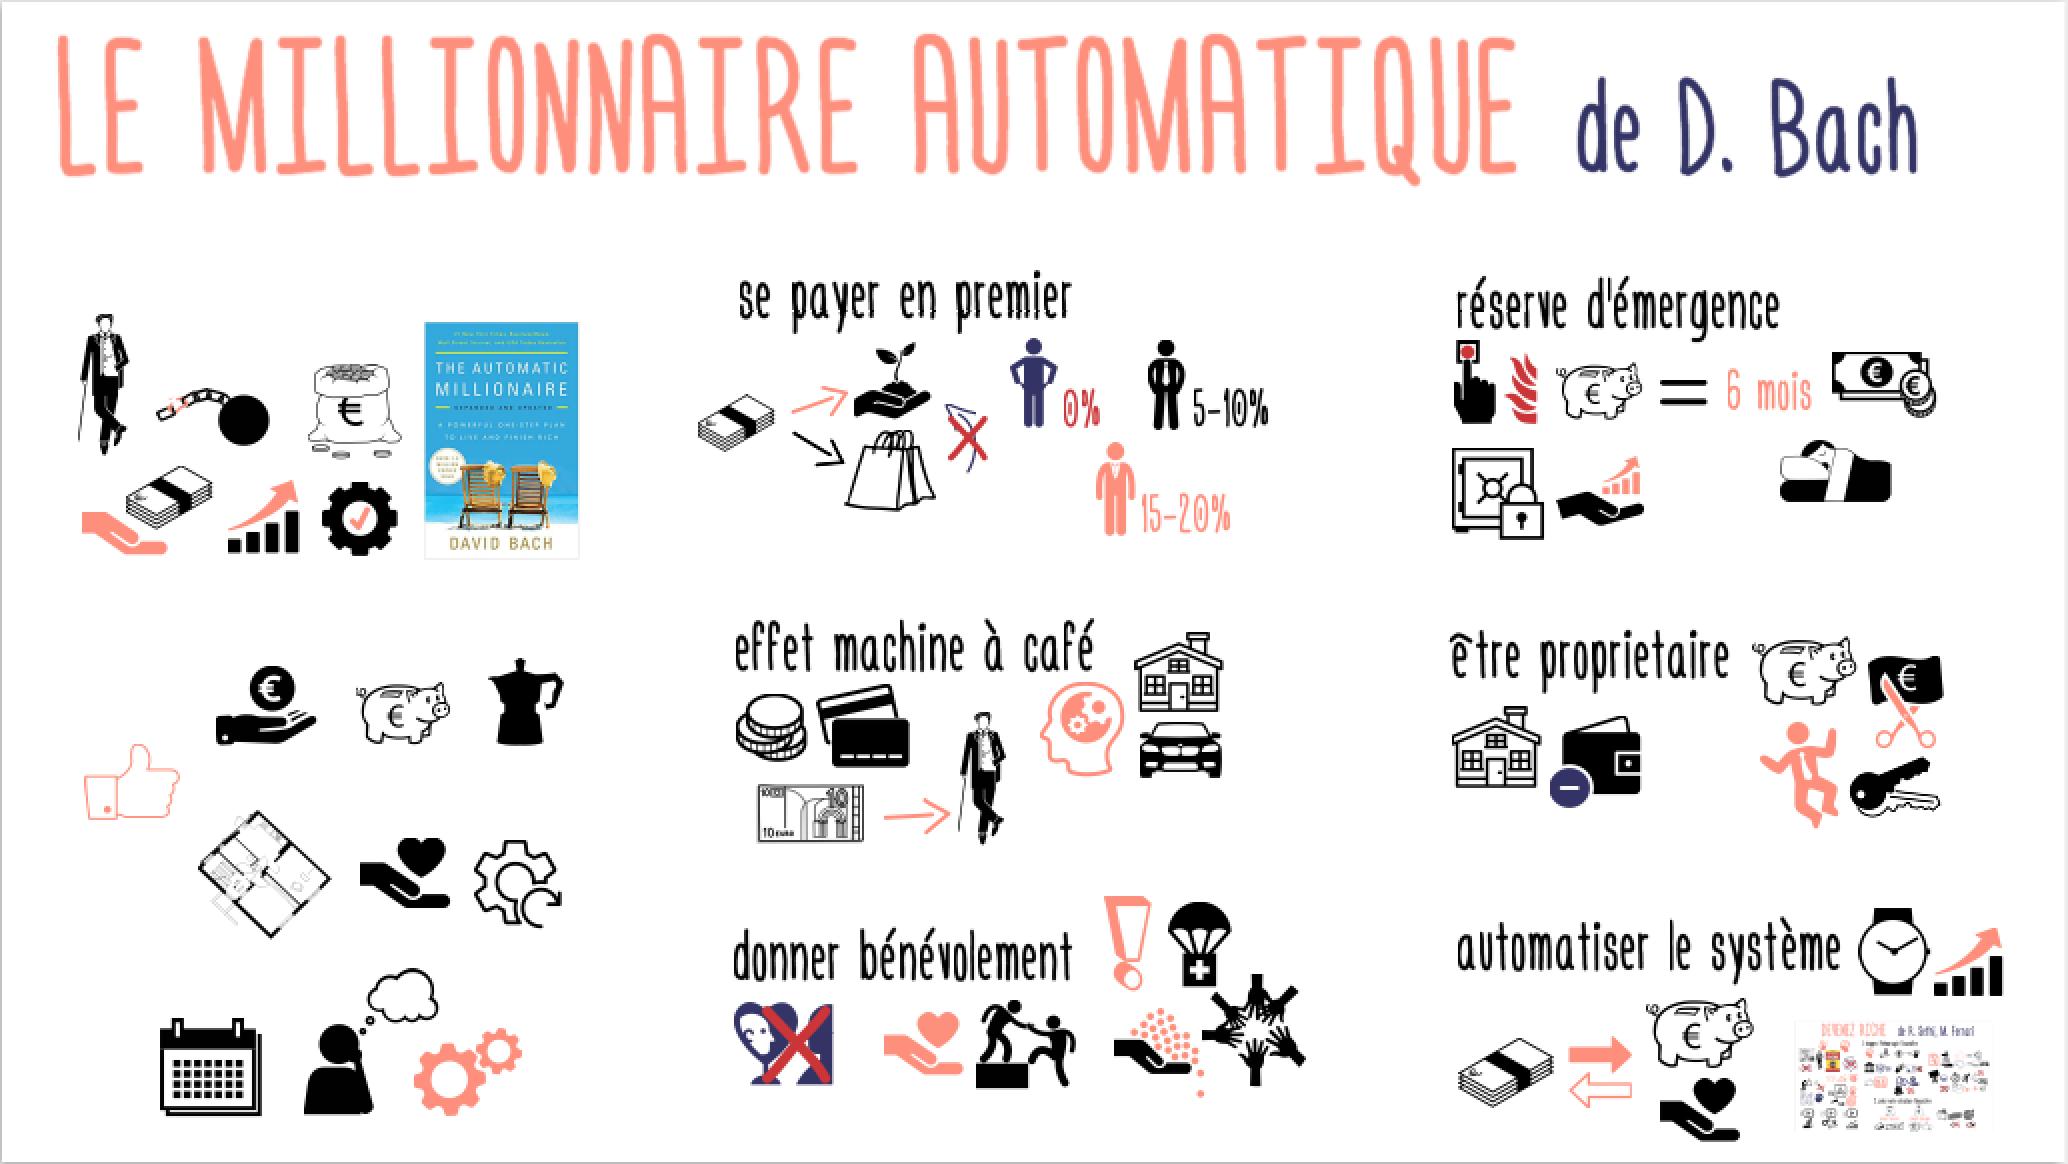 MillionnaireAutomatique